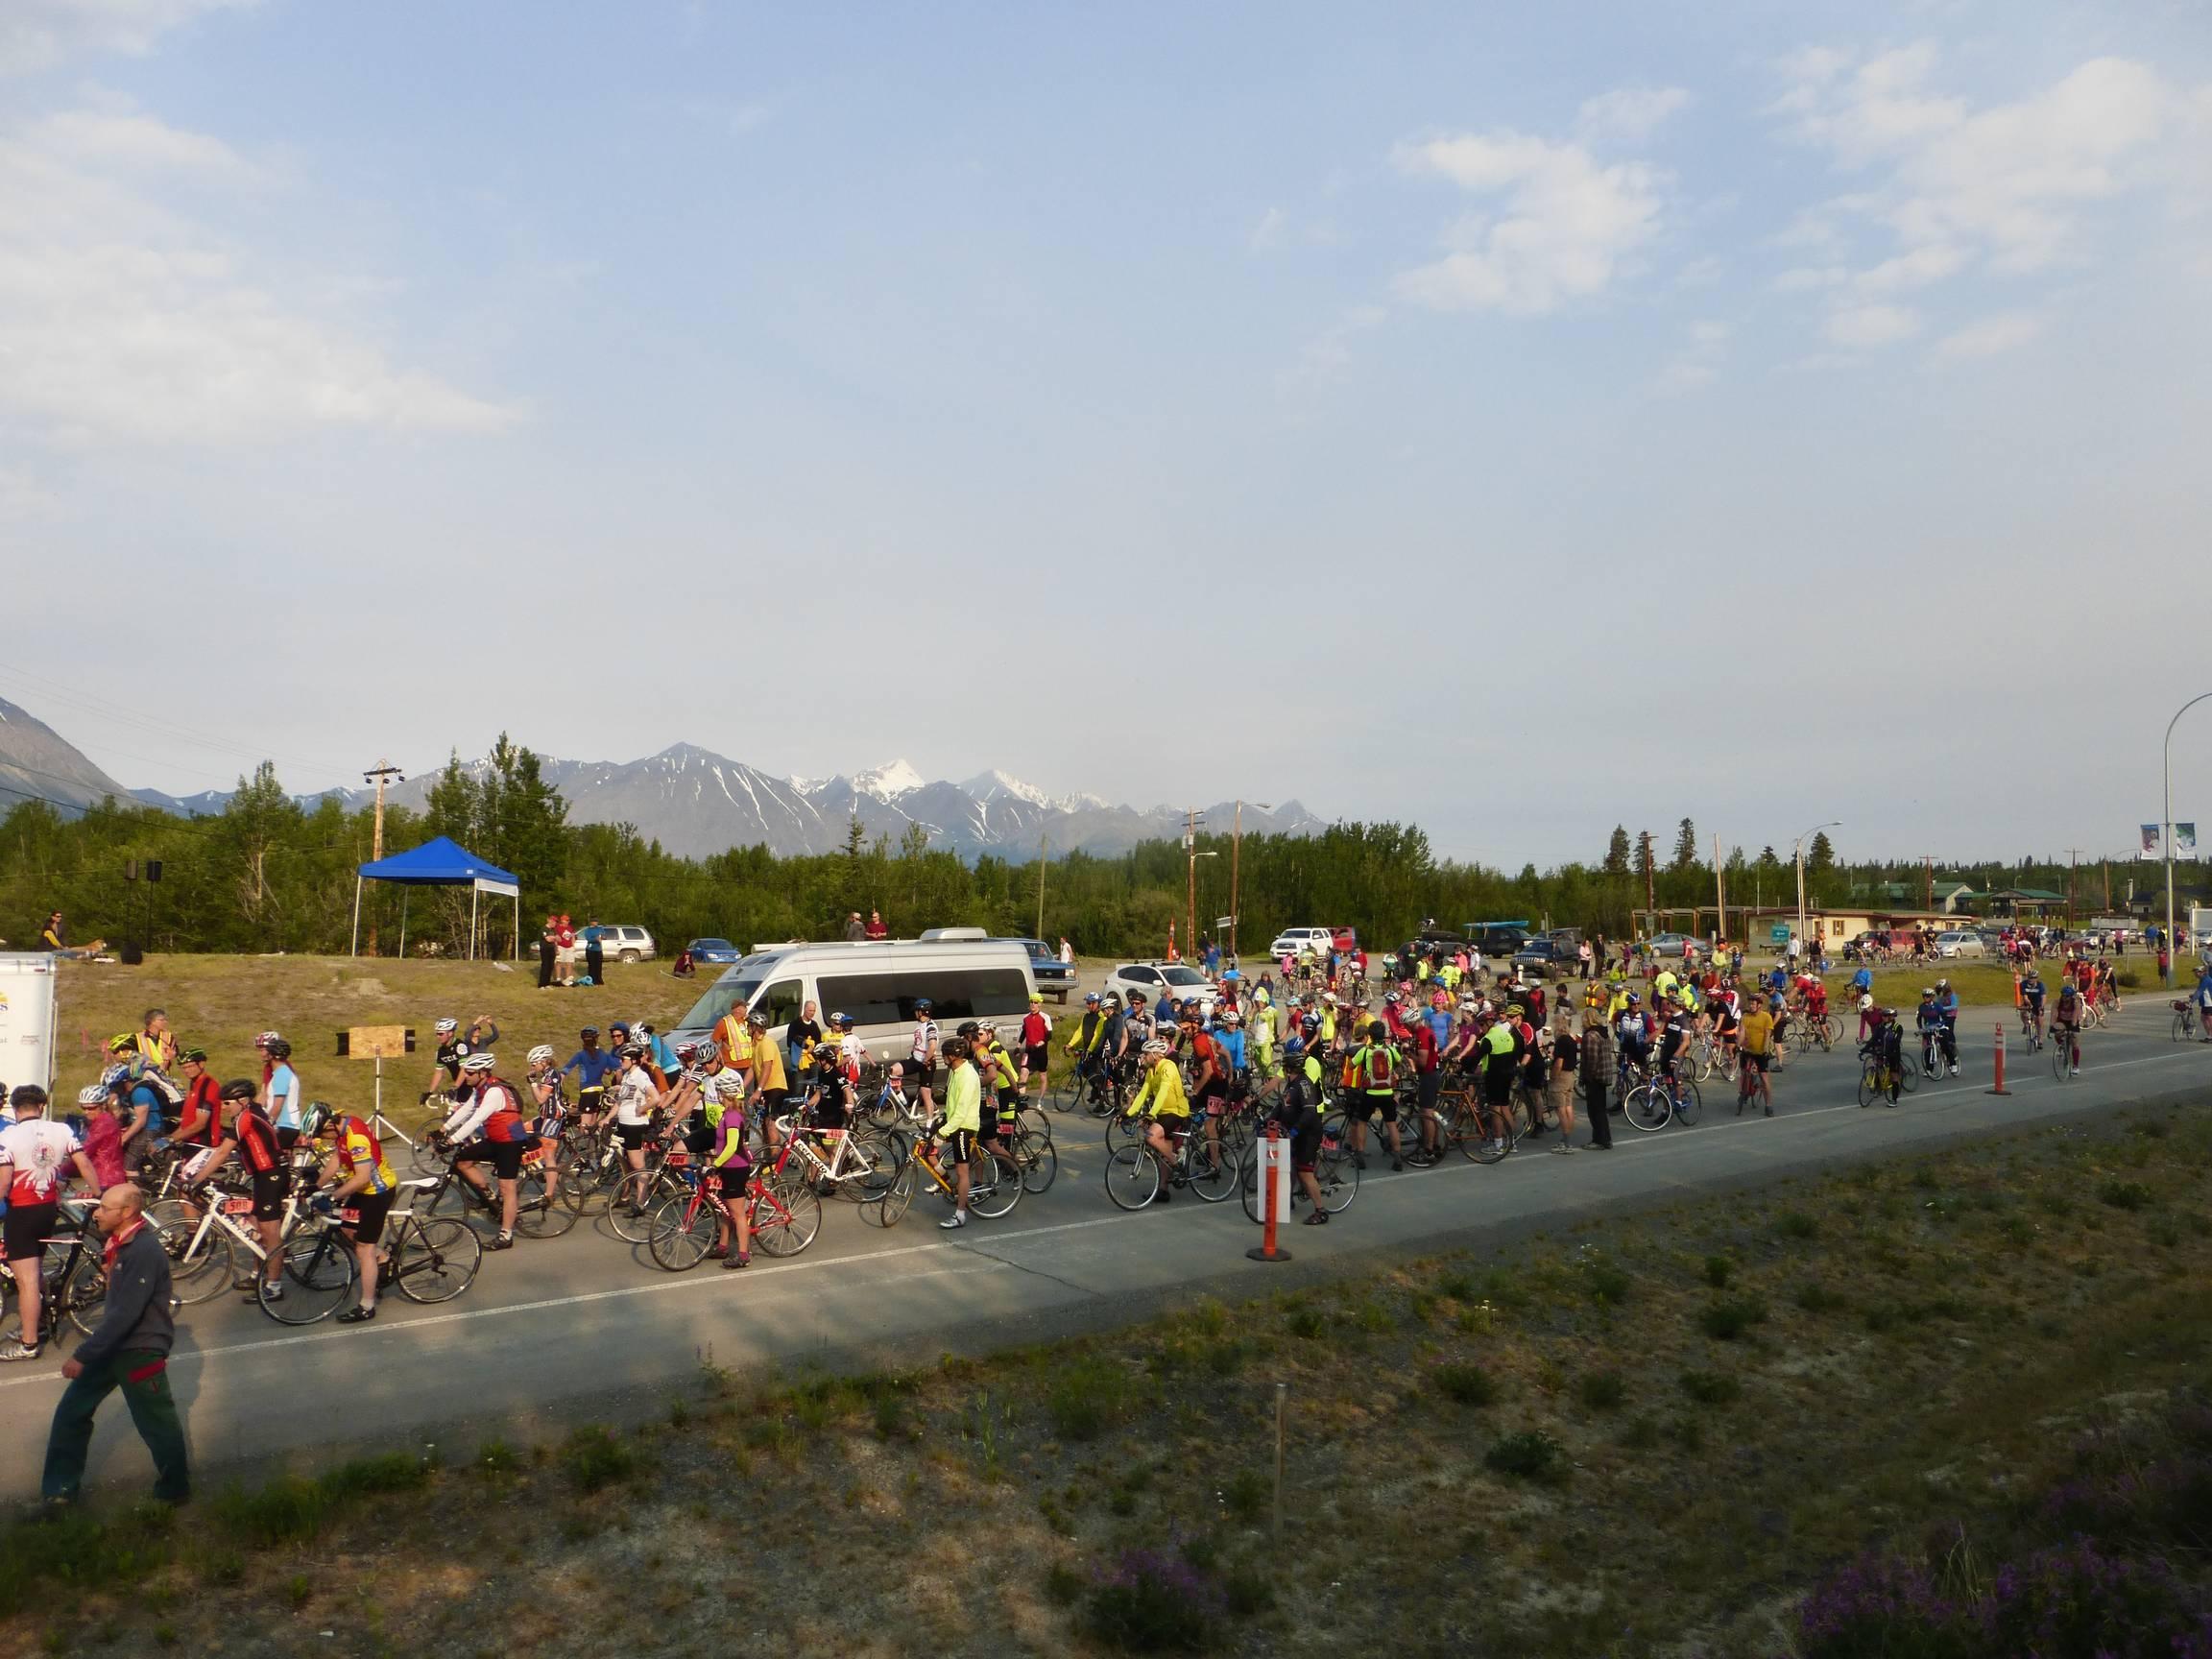 Kluane-Chilkat International Bike Relay b, June 2015